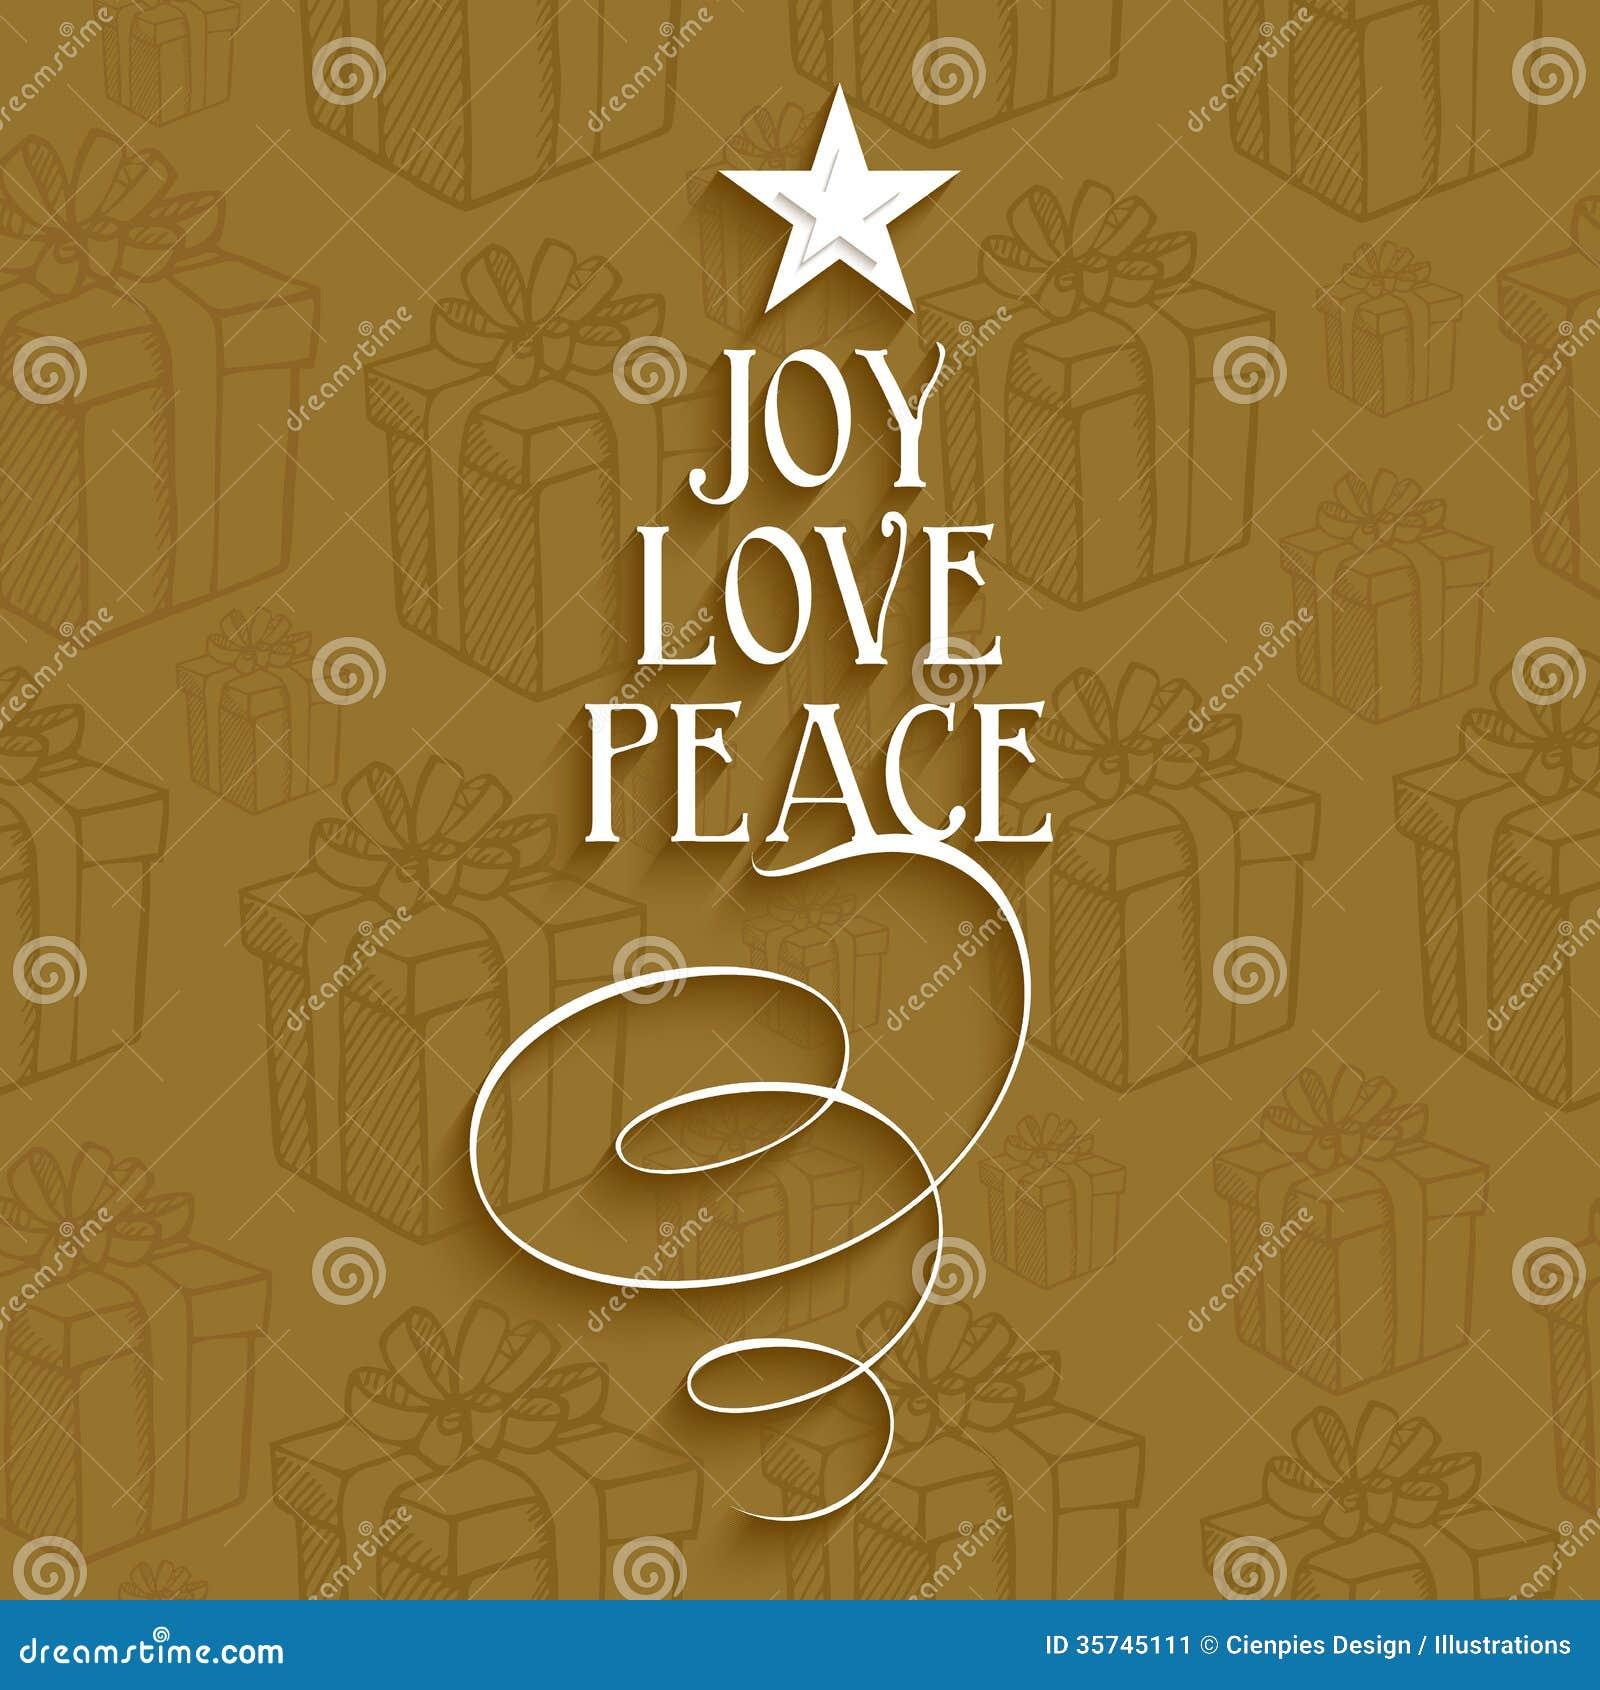 merry christmas holiday card